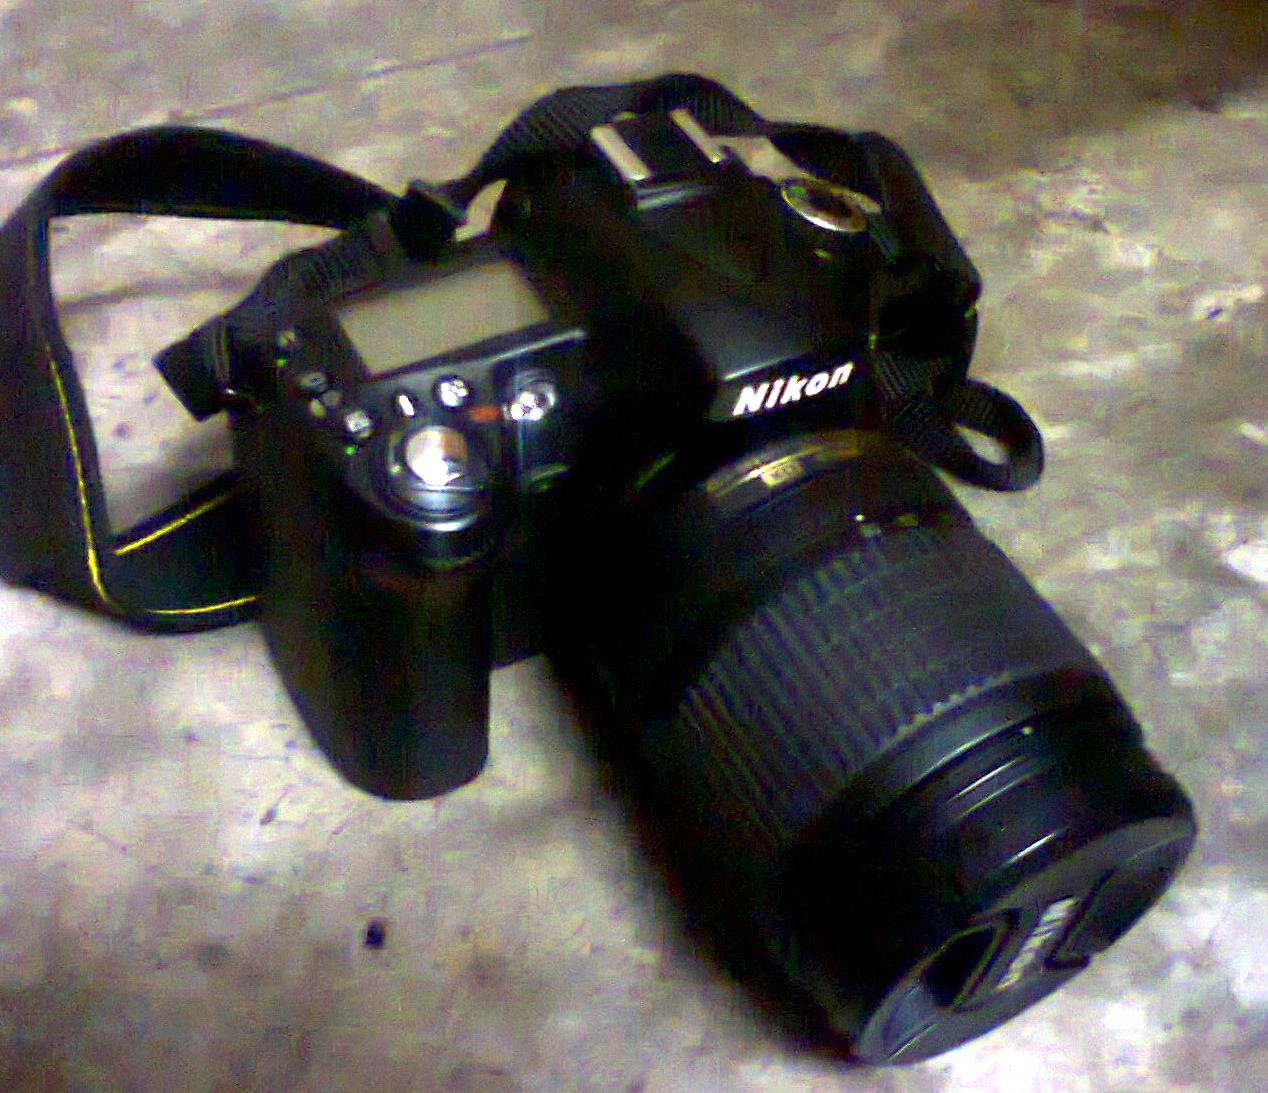 Camera Prices Of Dslr Cameras nikon d90 dslr camera clickbd large image 0 price